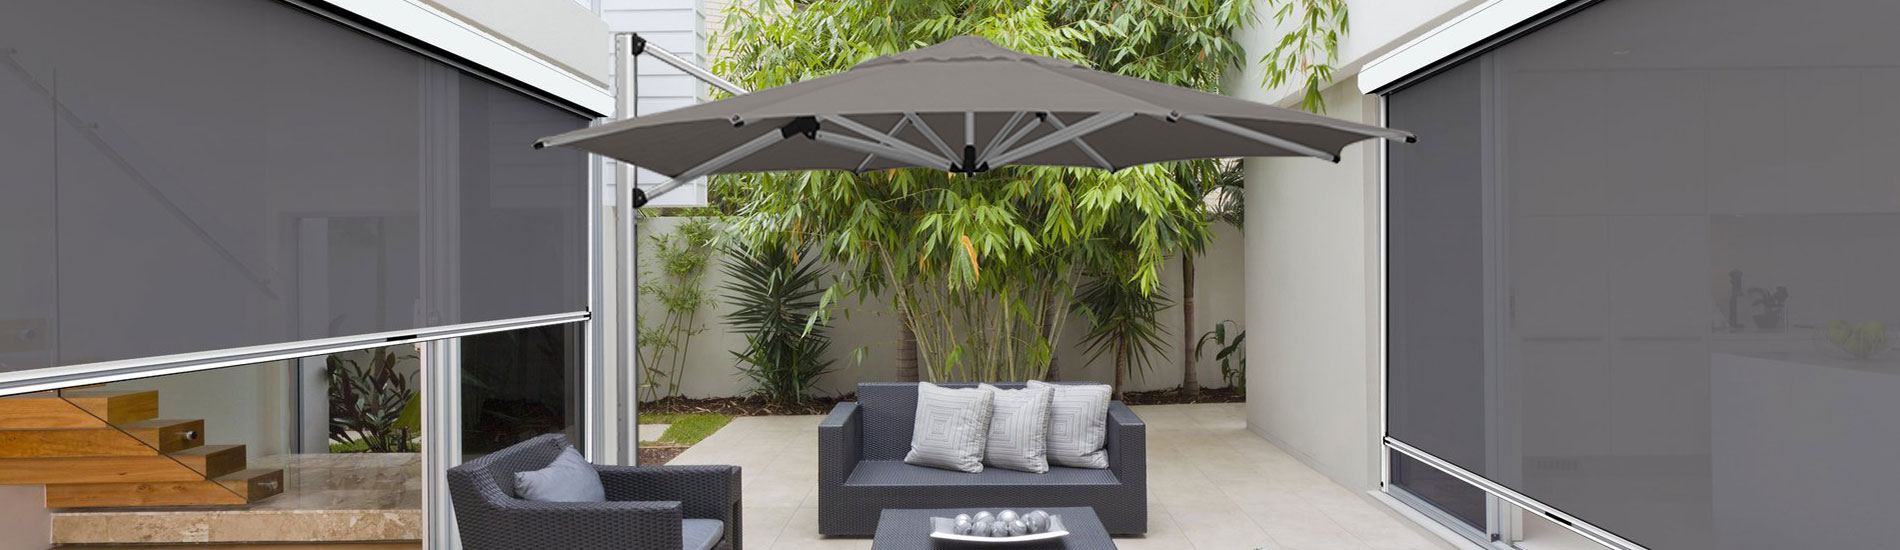 Outdoor Blinds Adelaide | Outdoor Umbrellas Adelaide